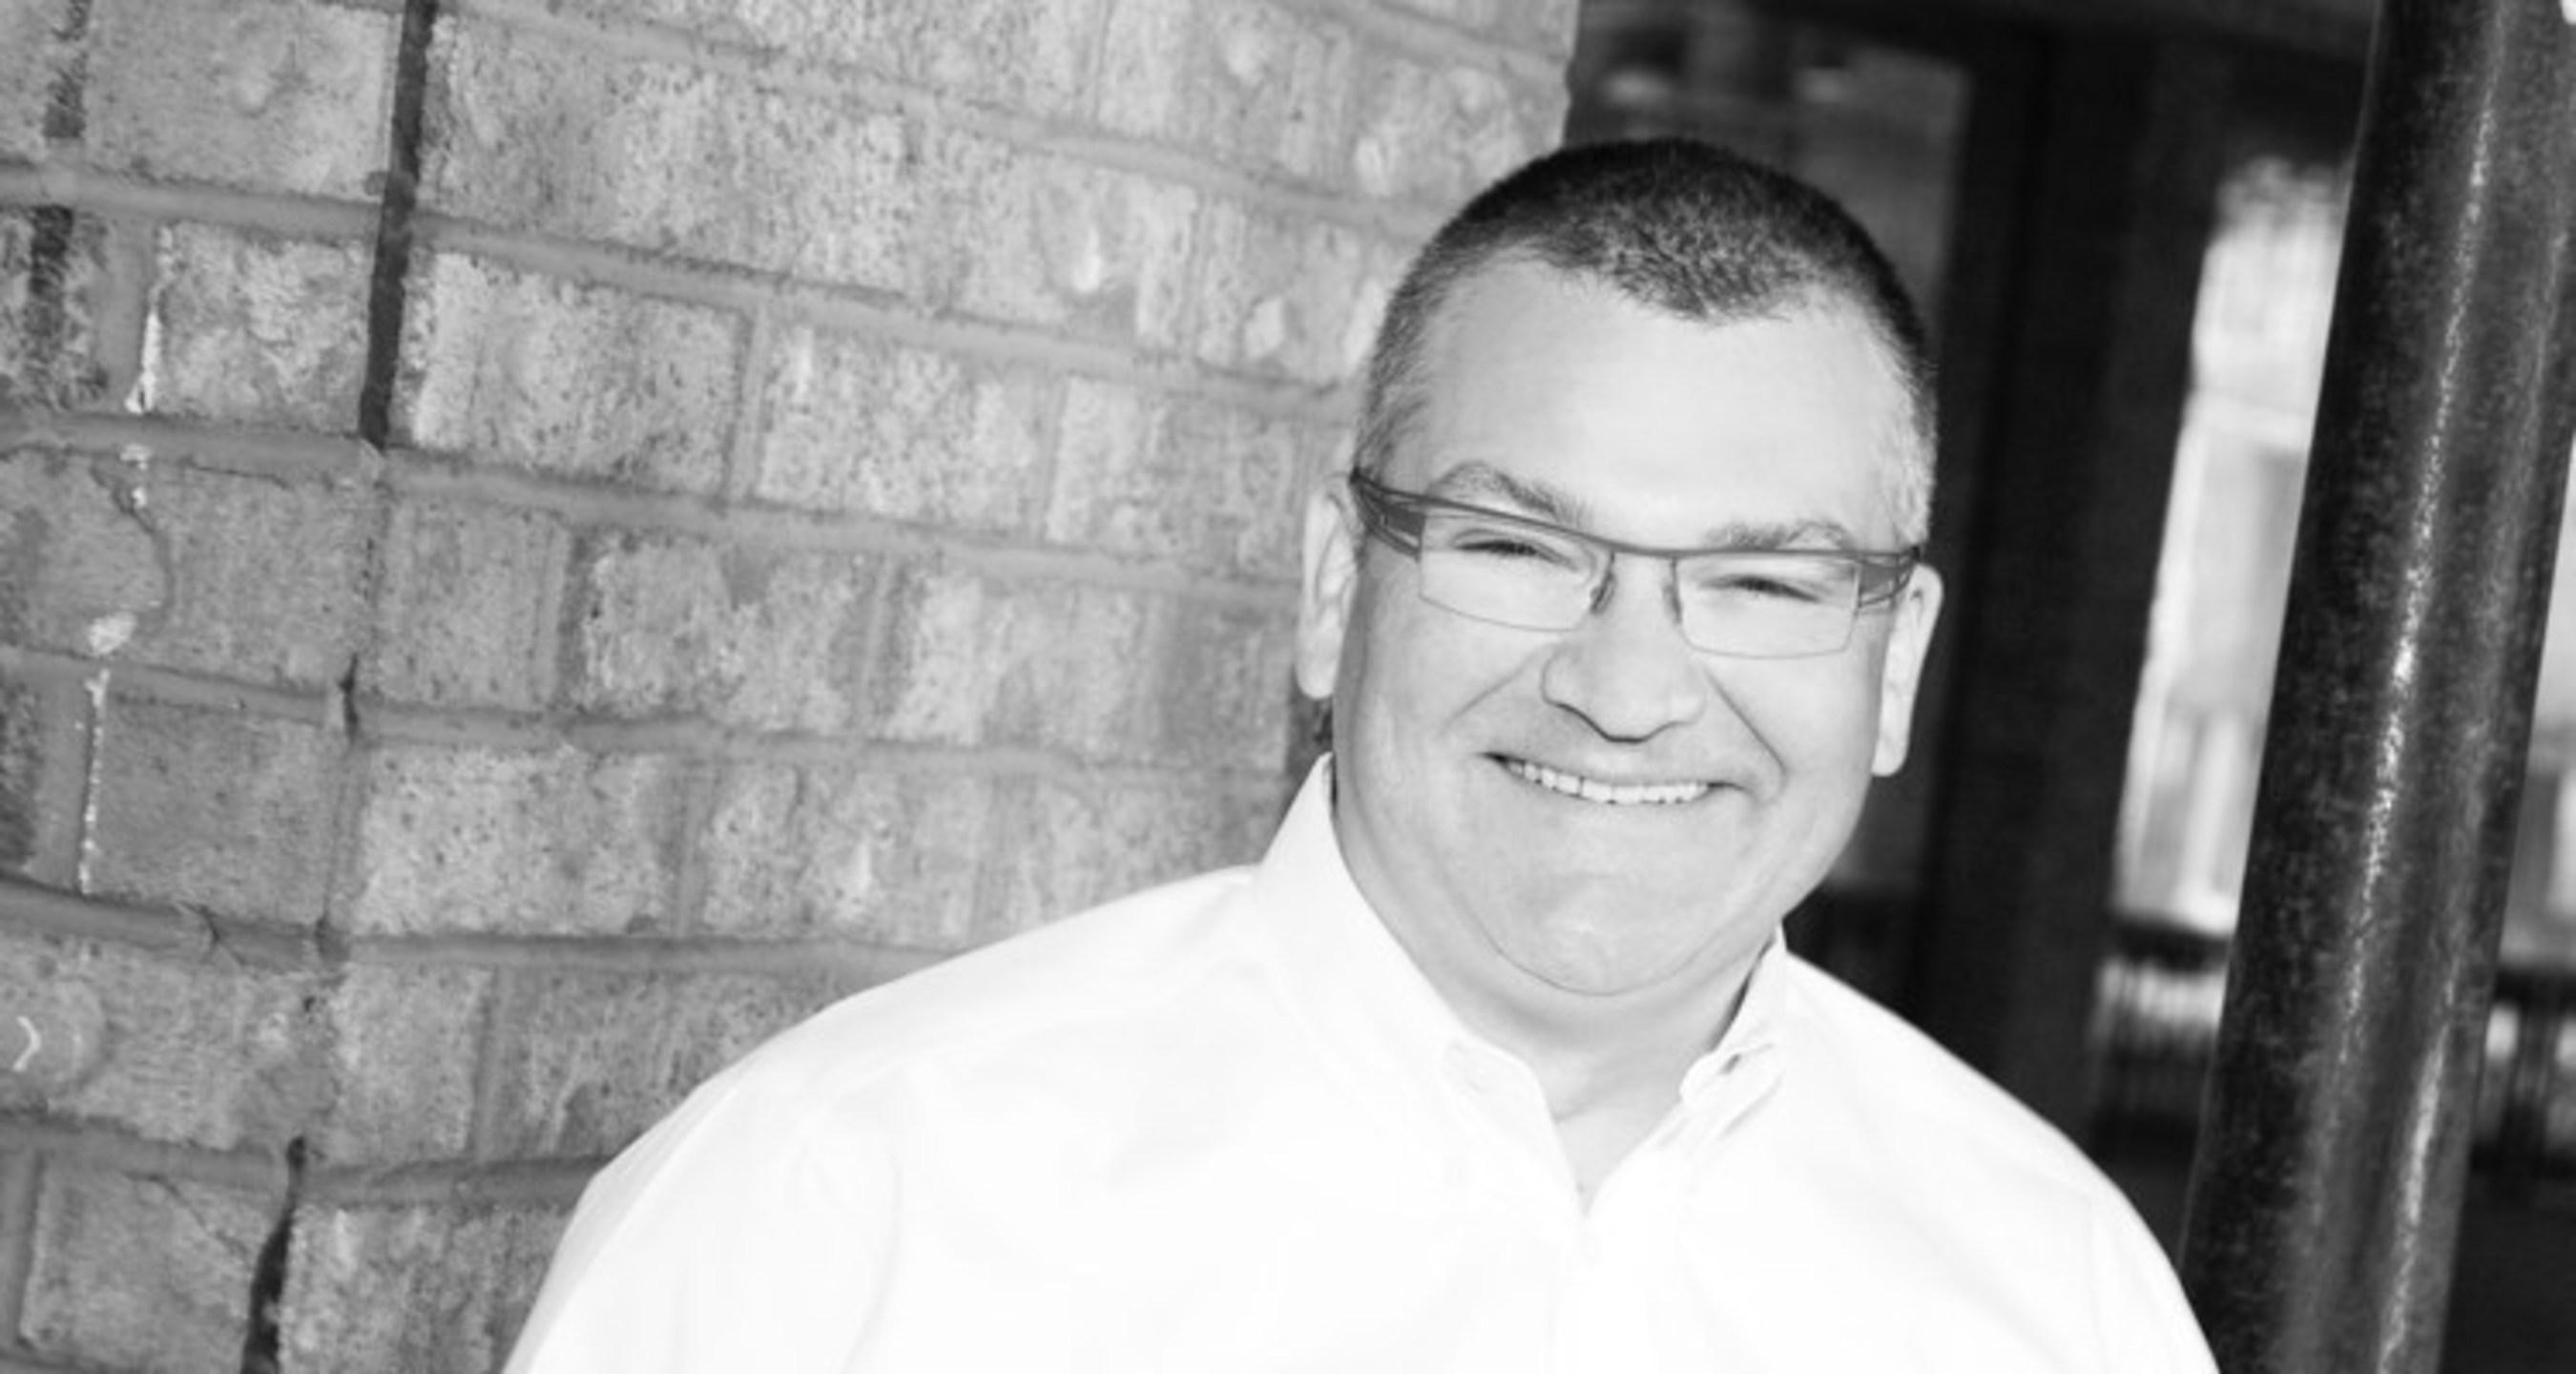 Dave Simons, senior vice president of engineering, Kik Interactive